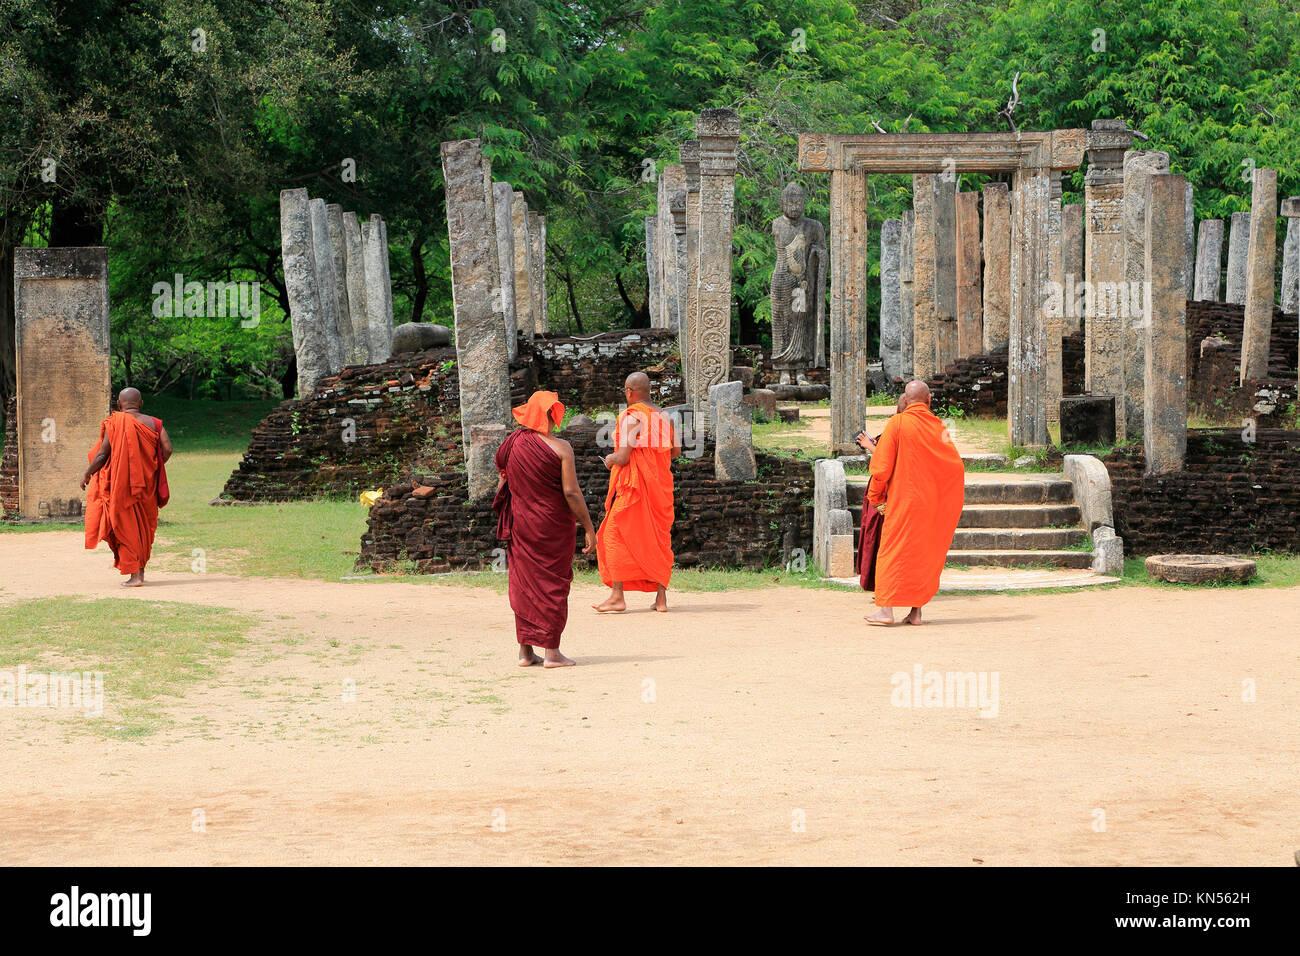 Atadage building in The Quadrangle, UNESCO World Heritage Site, the ancient city of Polonnaruwa, Sri Lanka, Asia - Stock Image